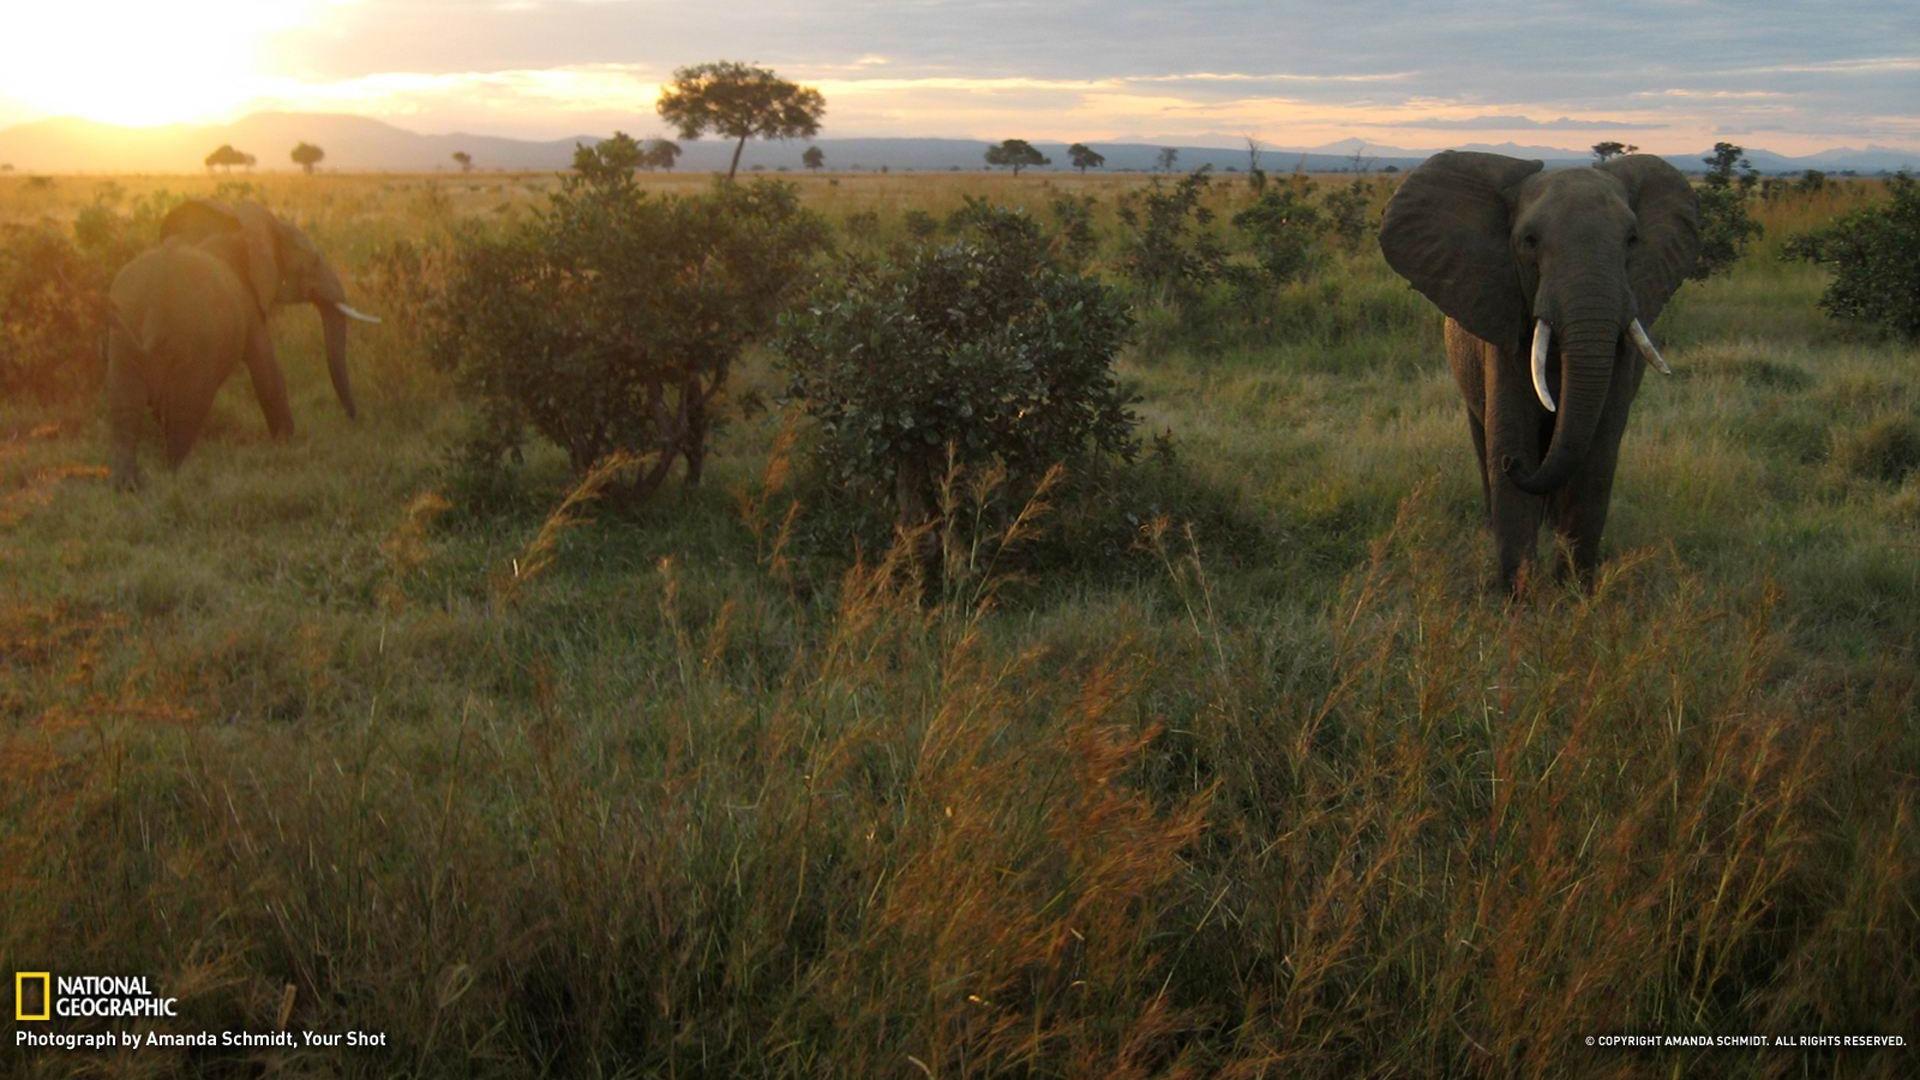 Elephants_Tanzania-National_Geographic_wallpapers_1920x1080.jpg